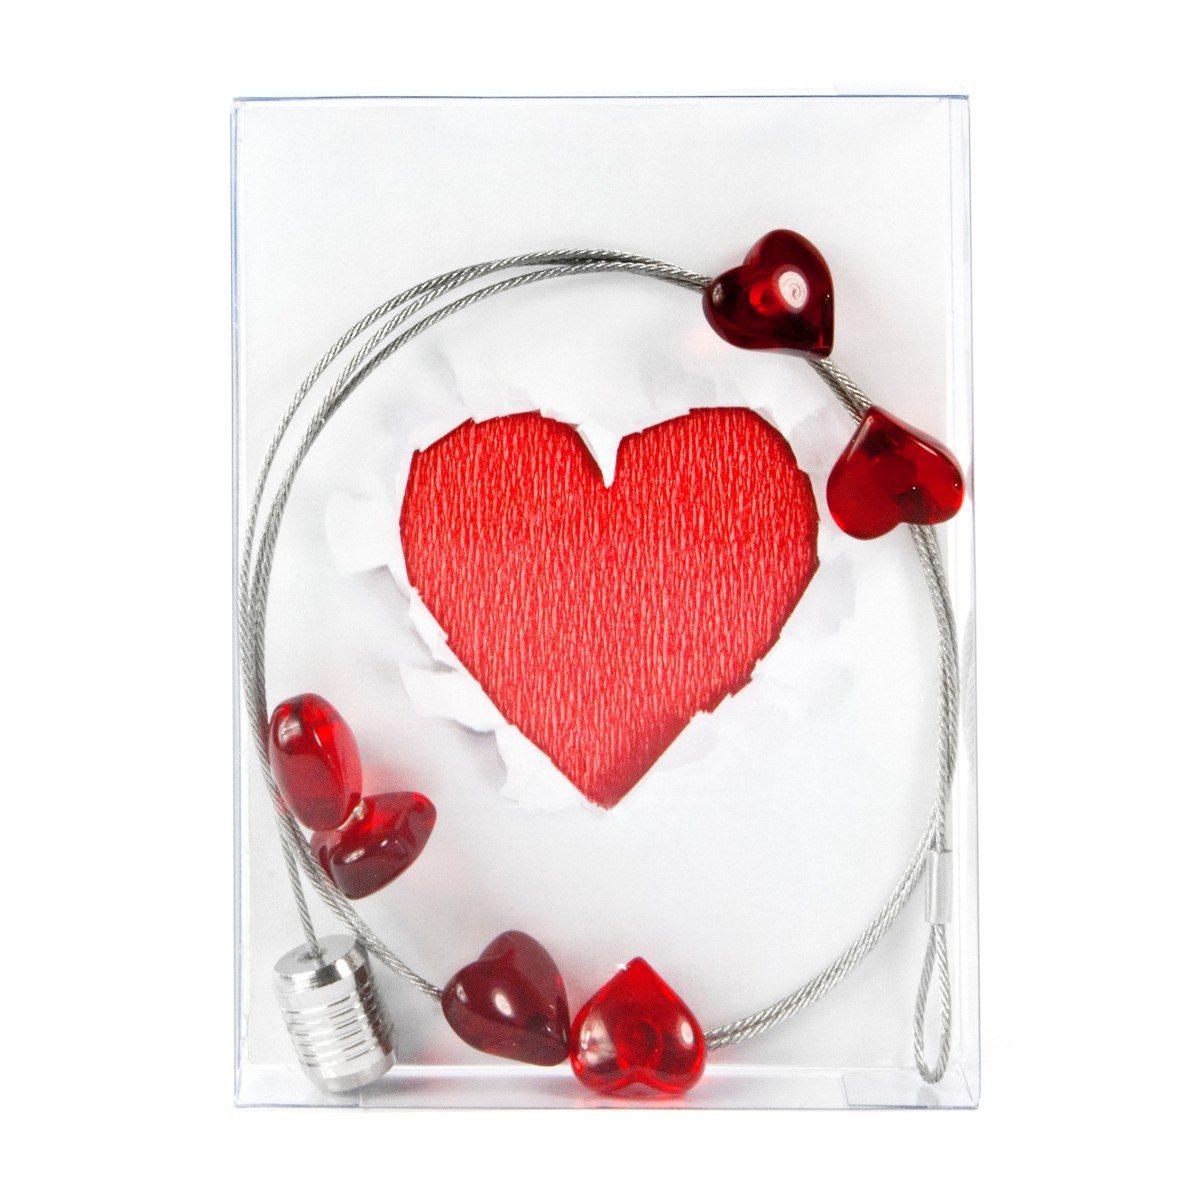 Billedesnor med hjerter